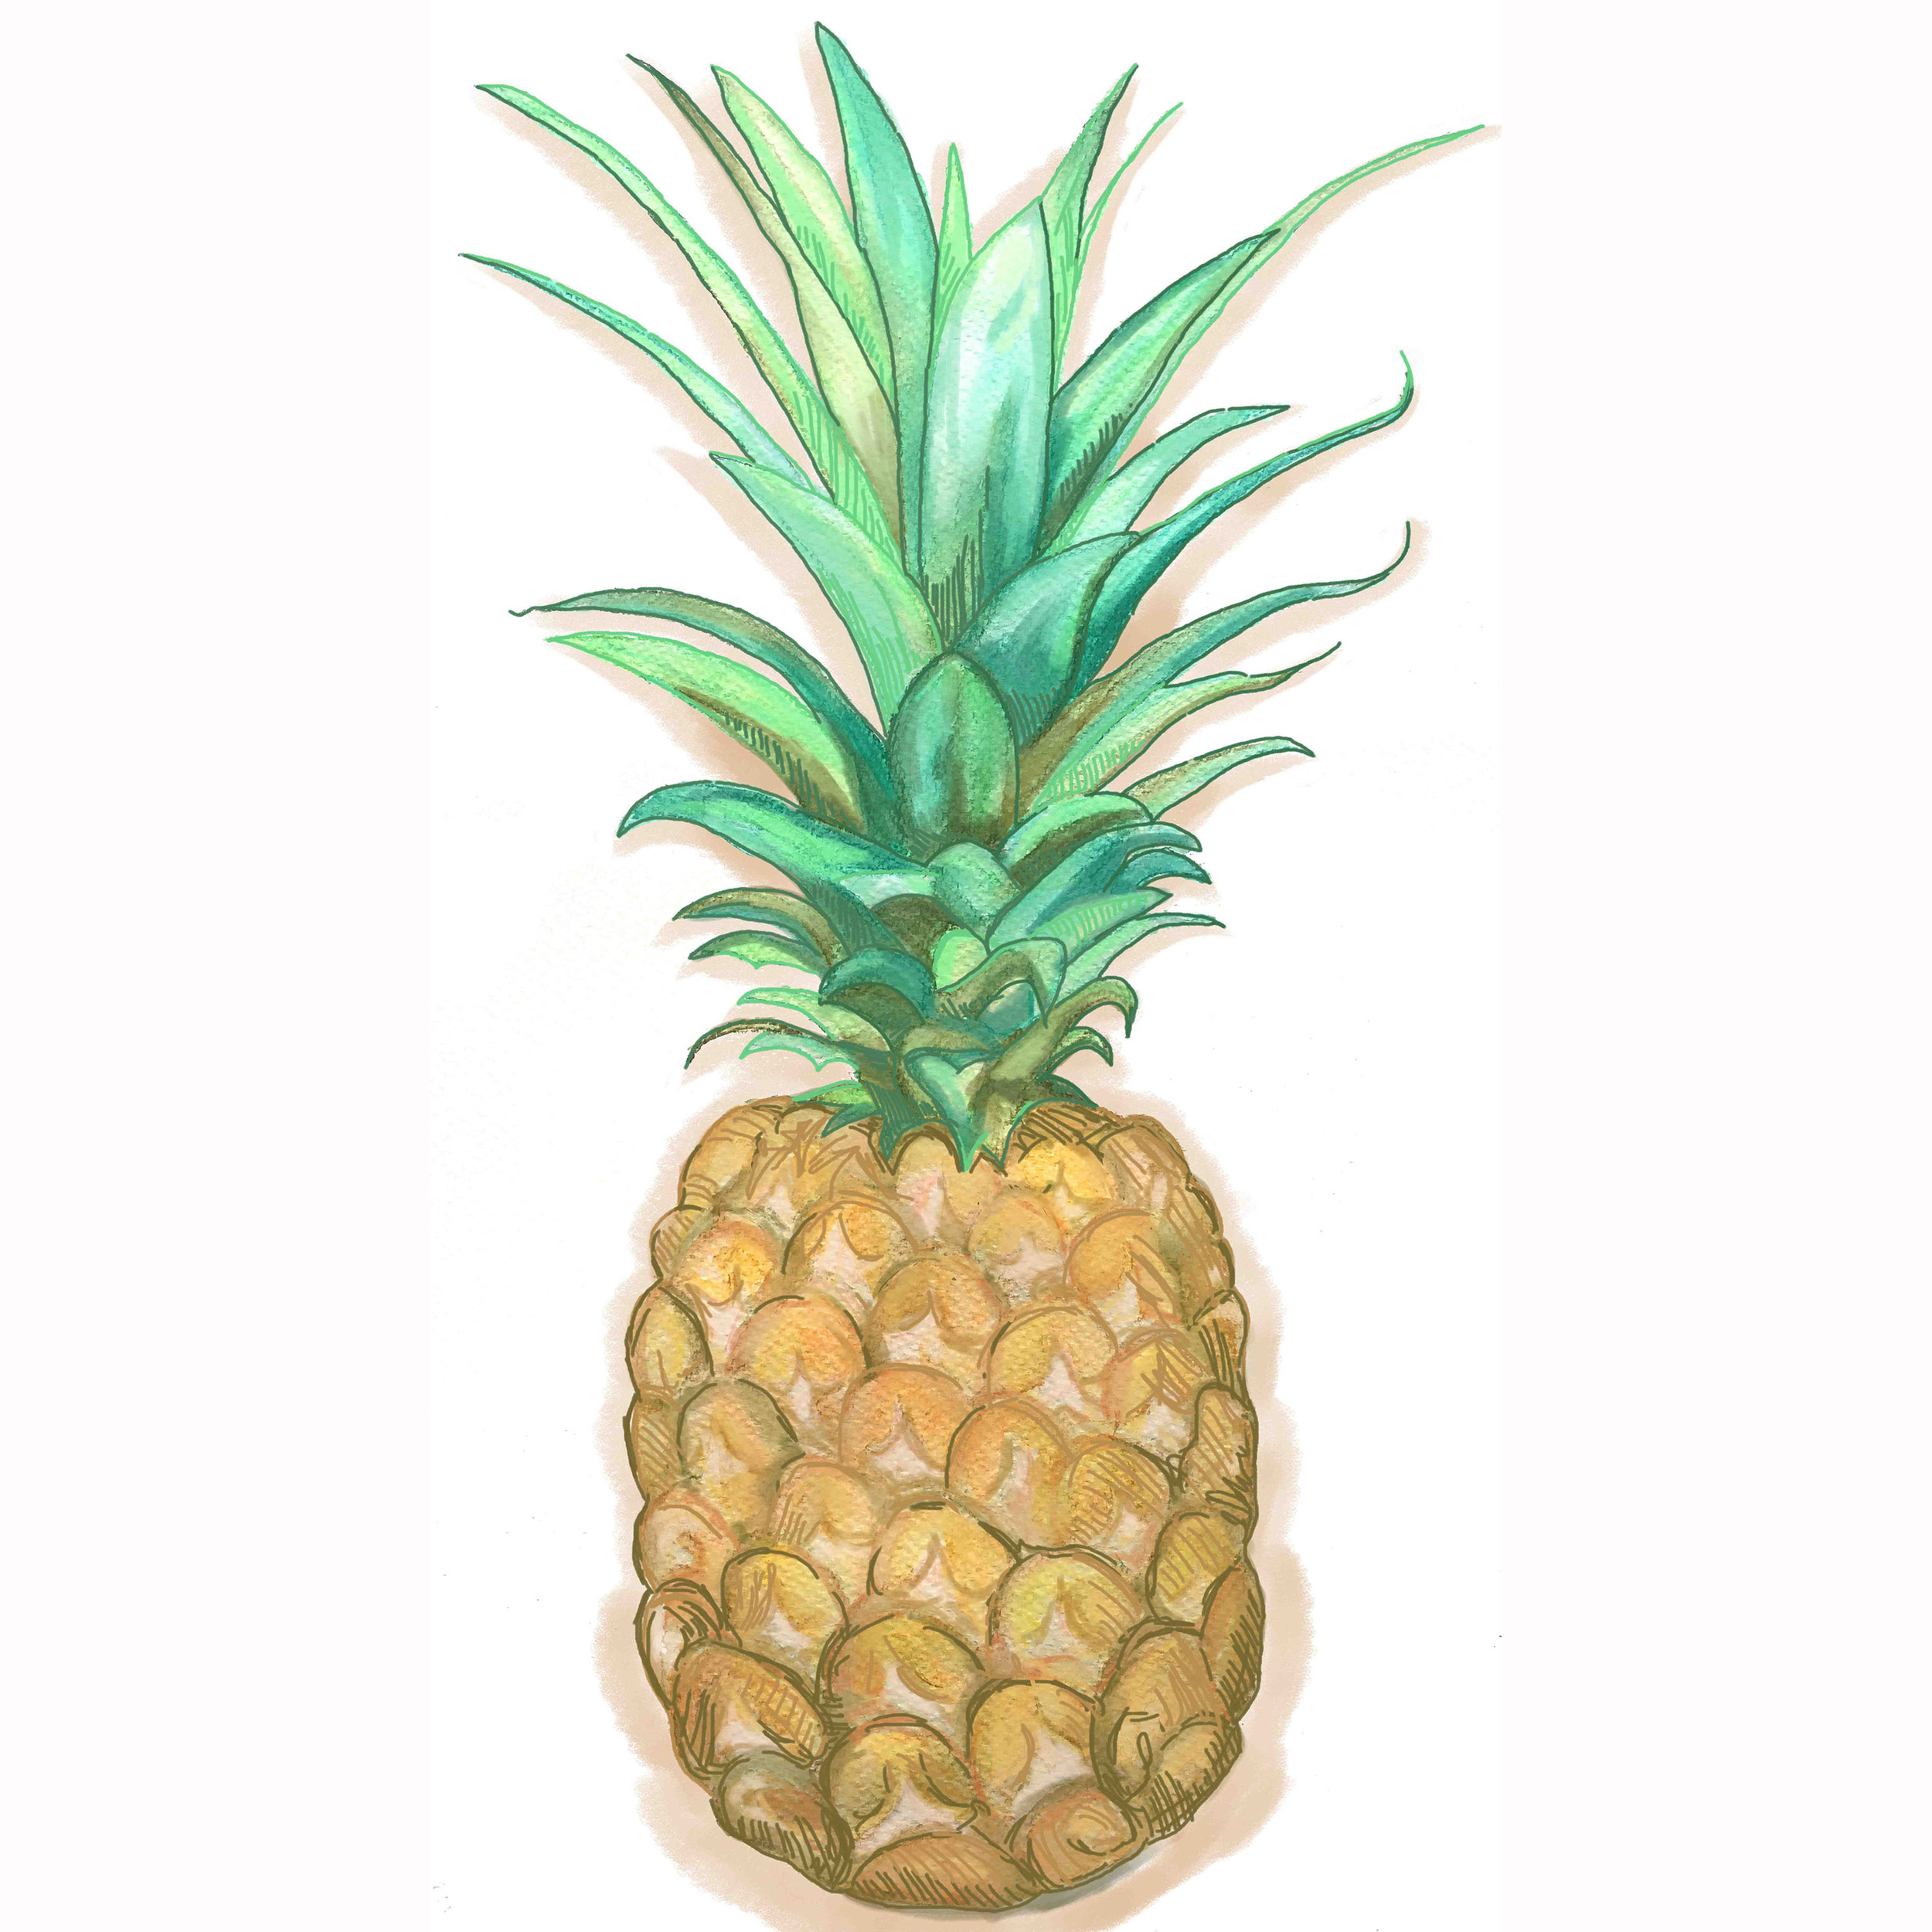 - pineapple illustration -